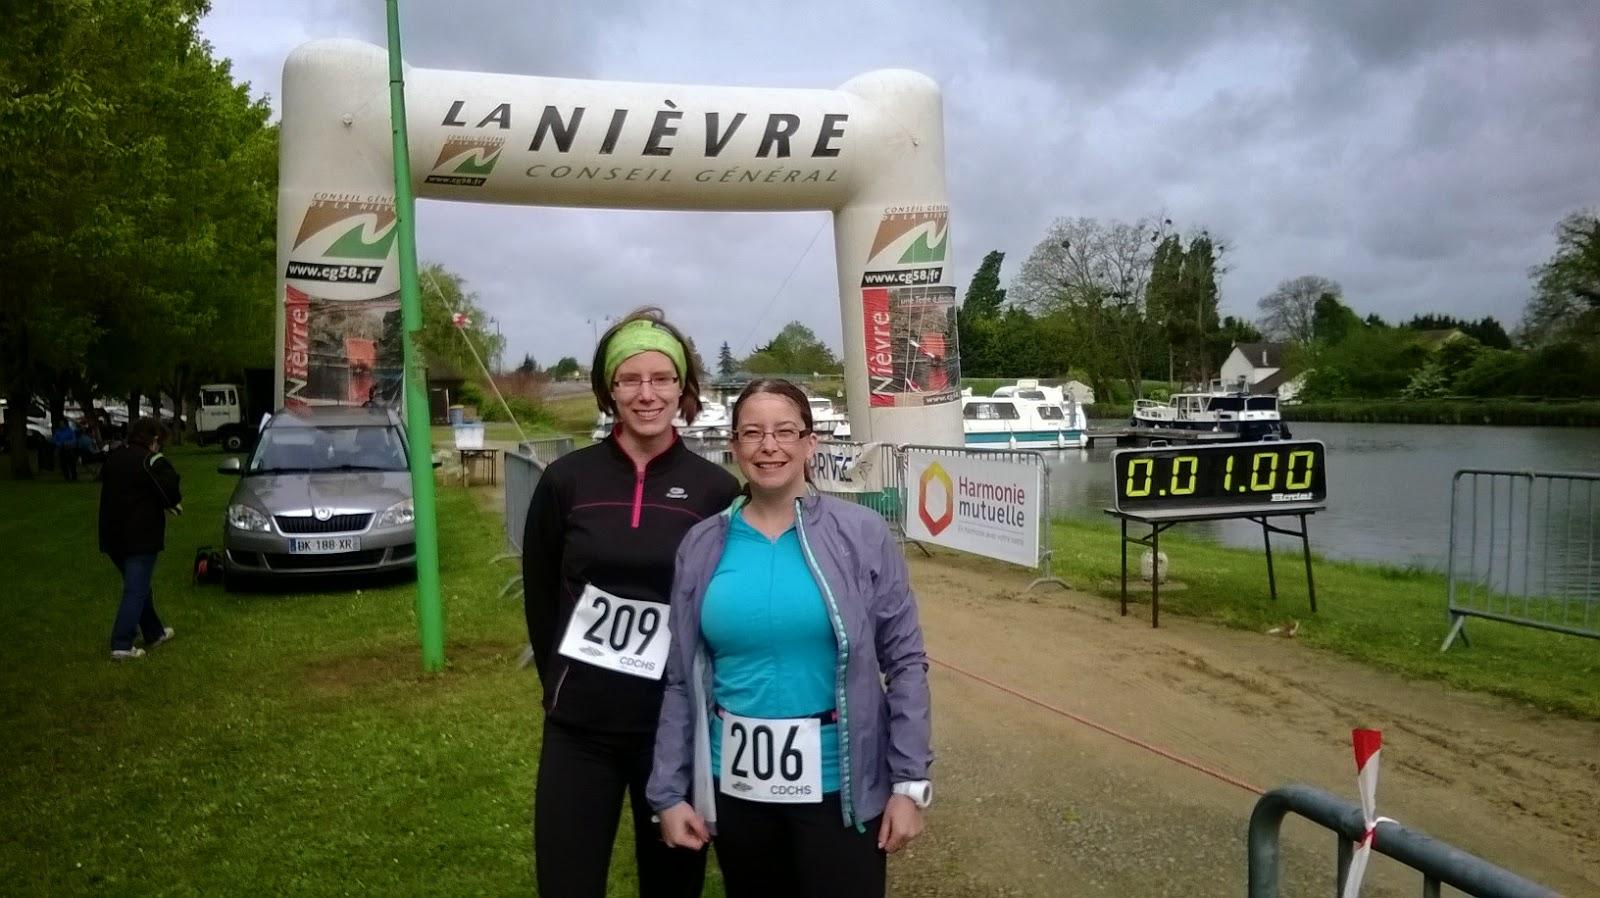 http://lafilleauxbasketsroses.blogspot.com/2014/04/cr-des-boucles-de-sermoise-5km.html